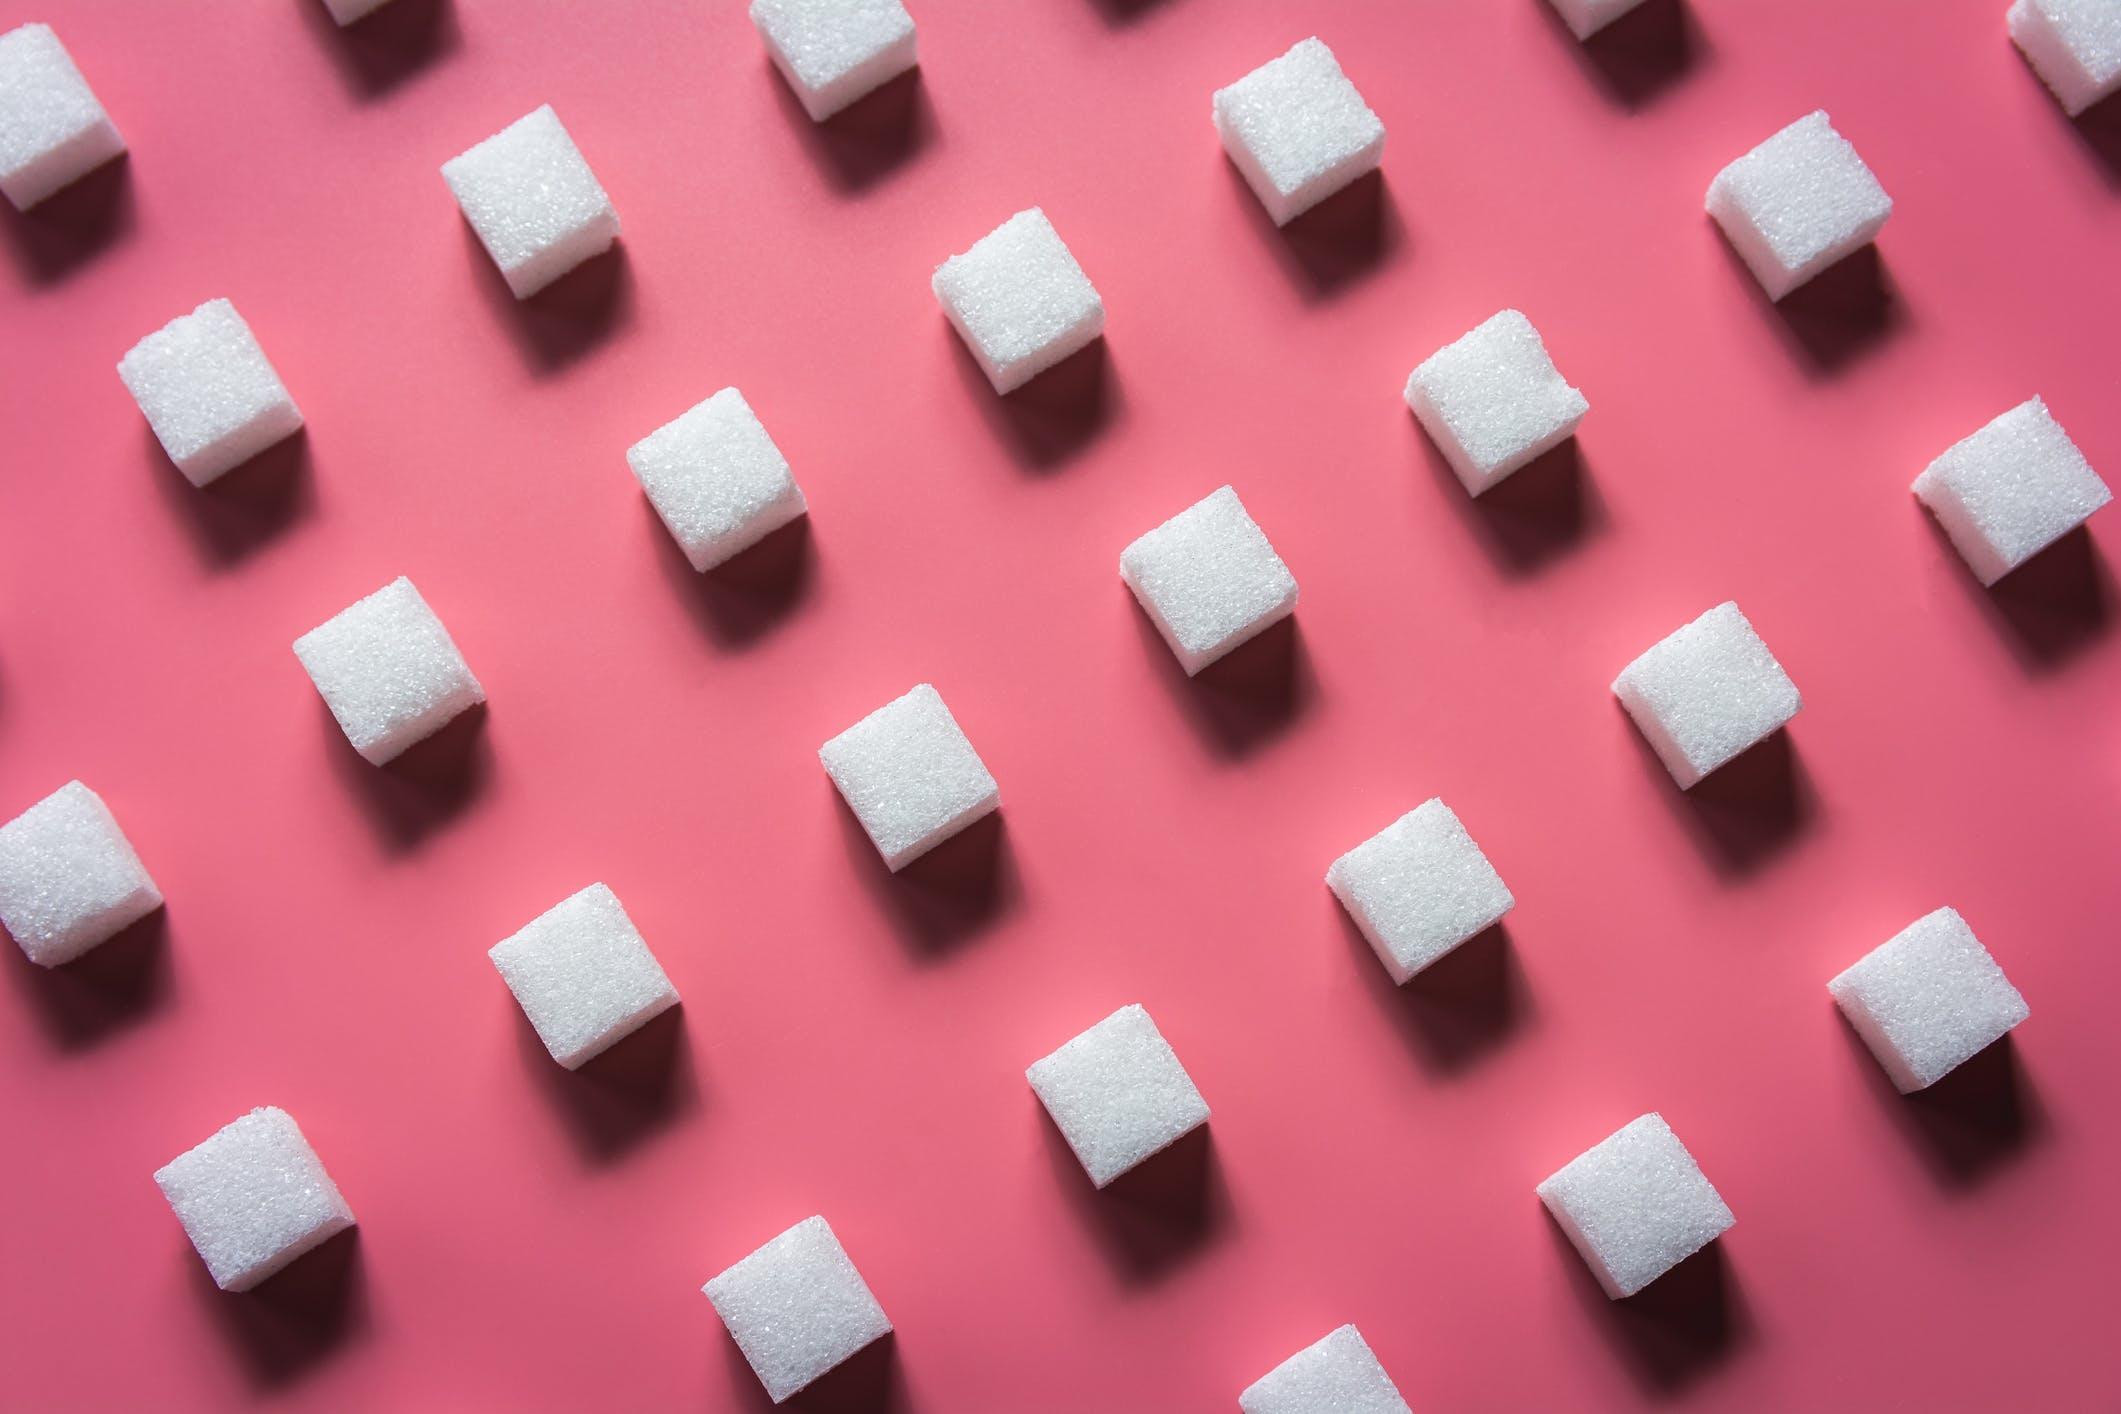 War on sugar reaches tipping point